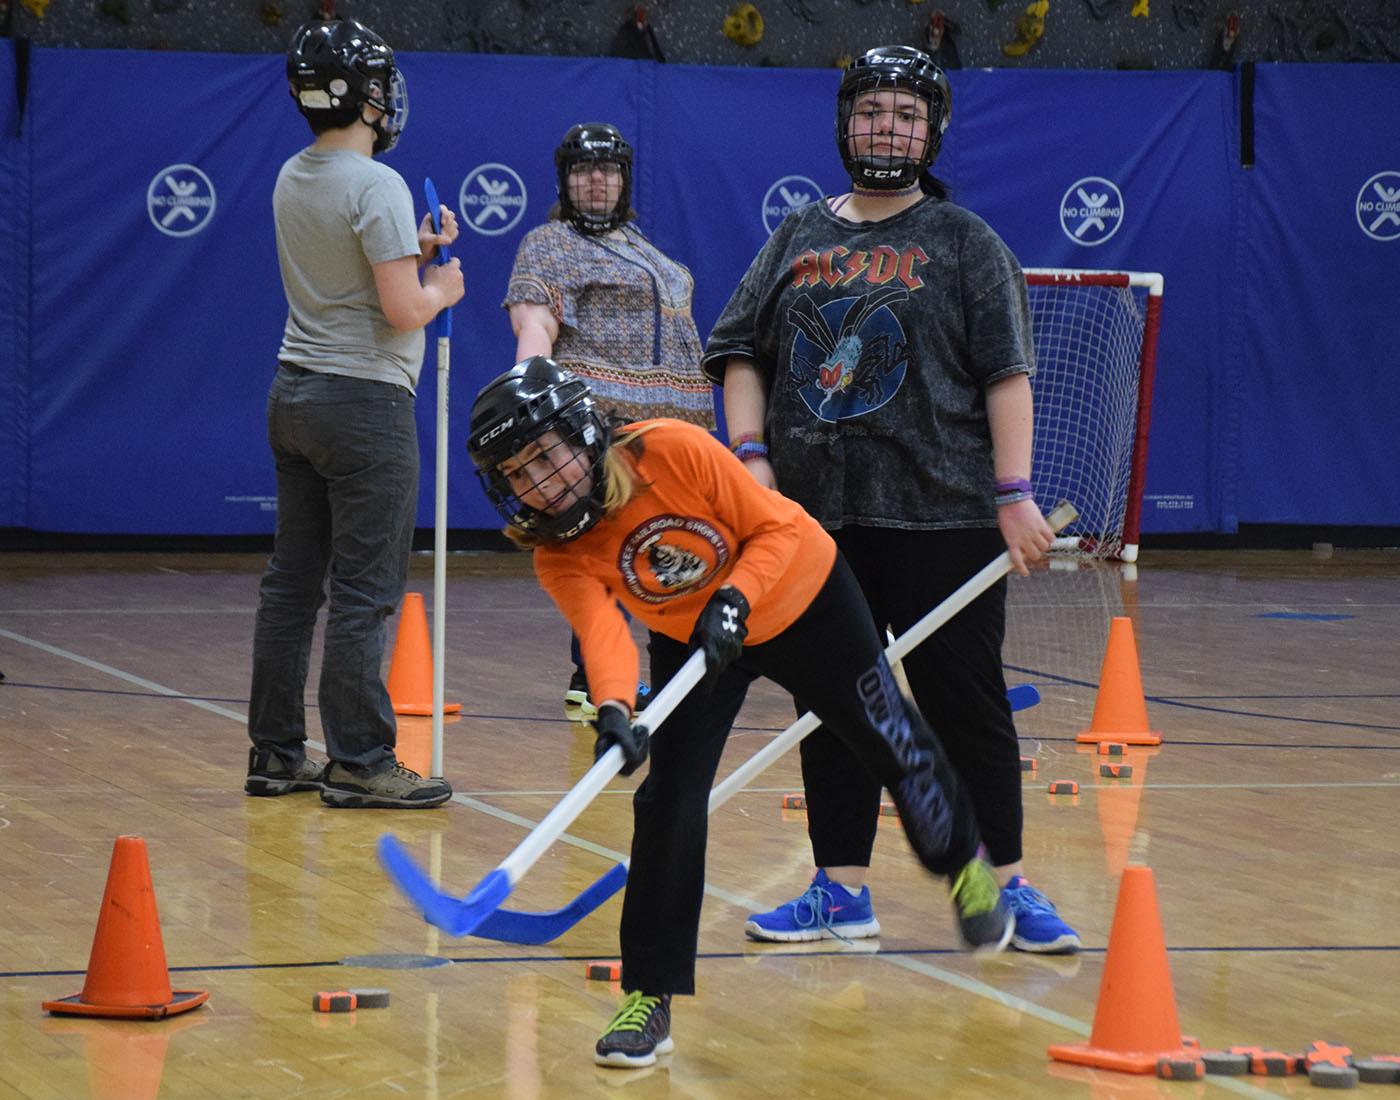 Junior Melinda Abernathy practices her shot